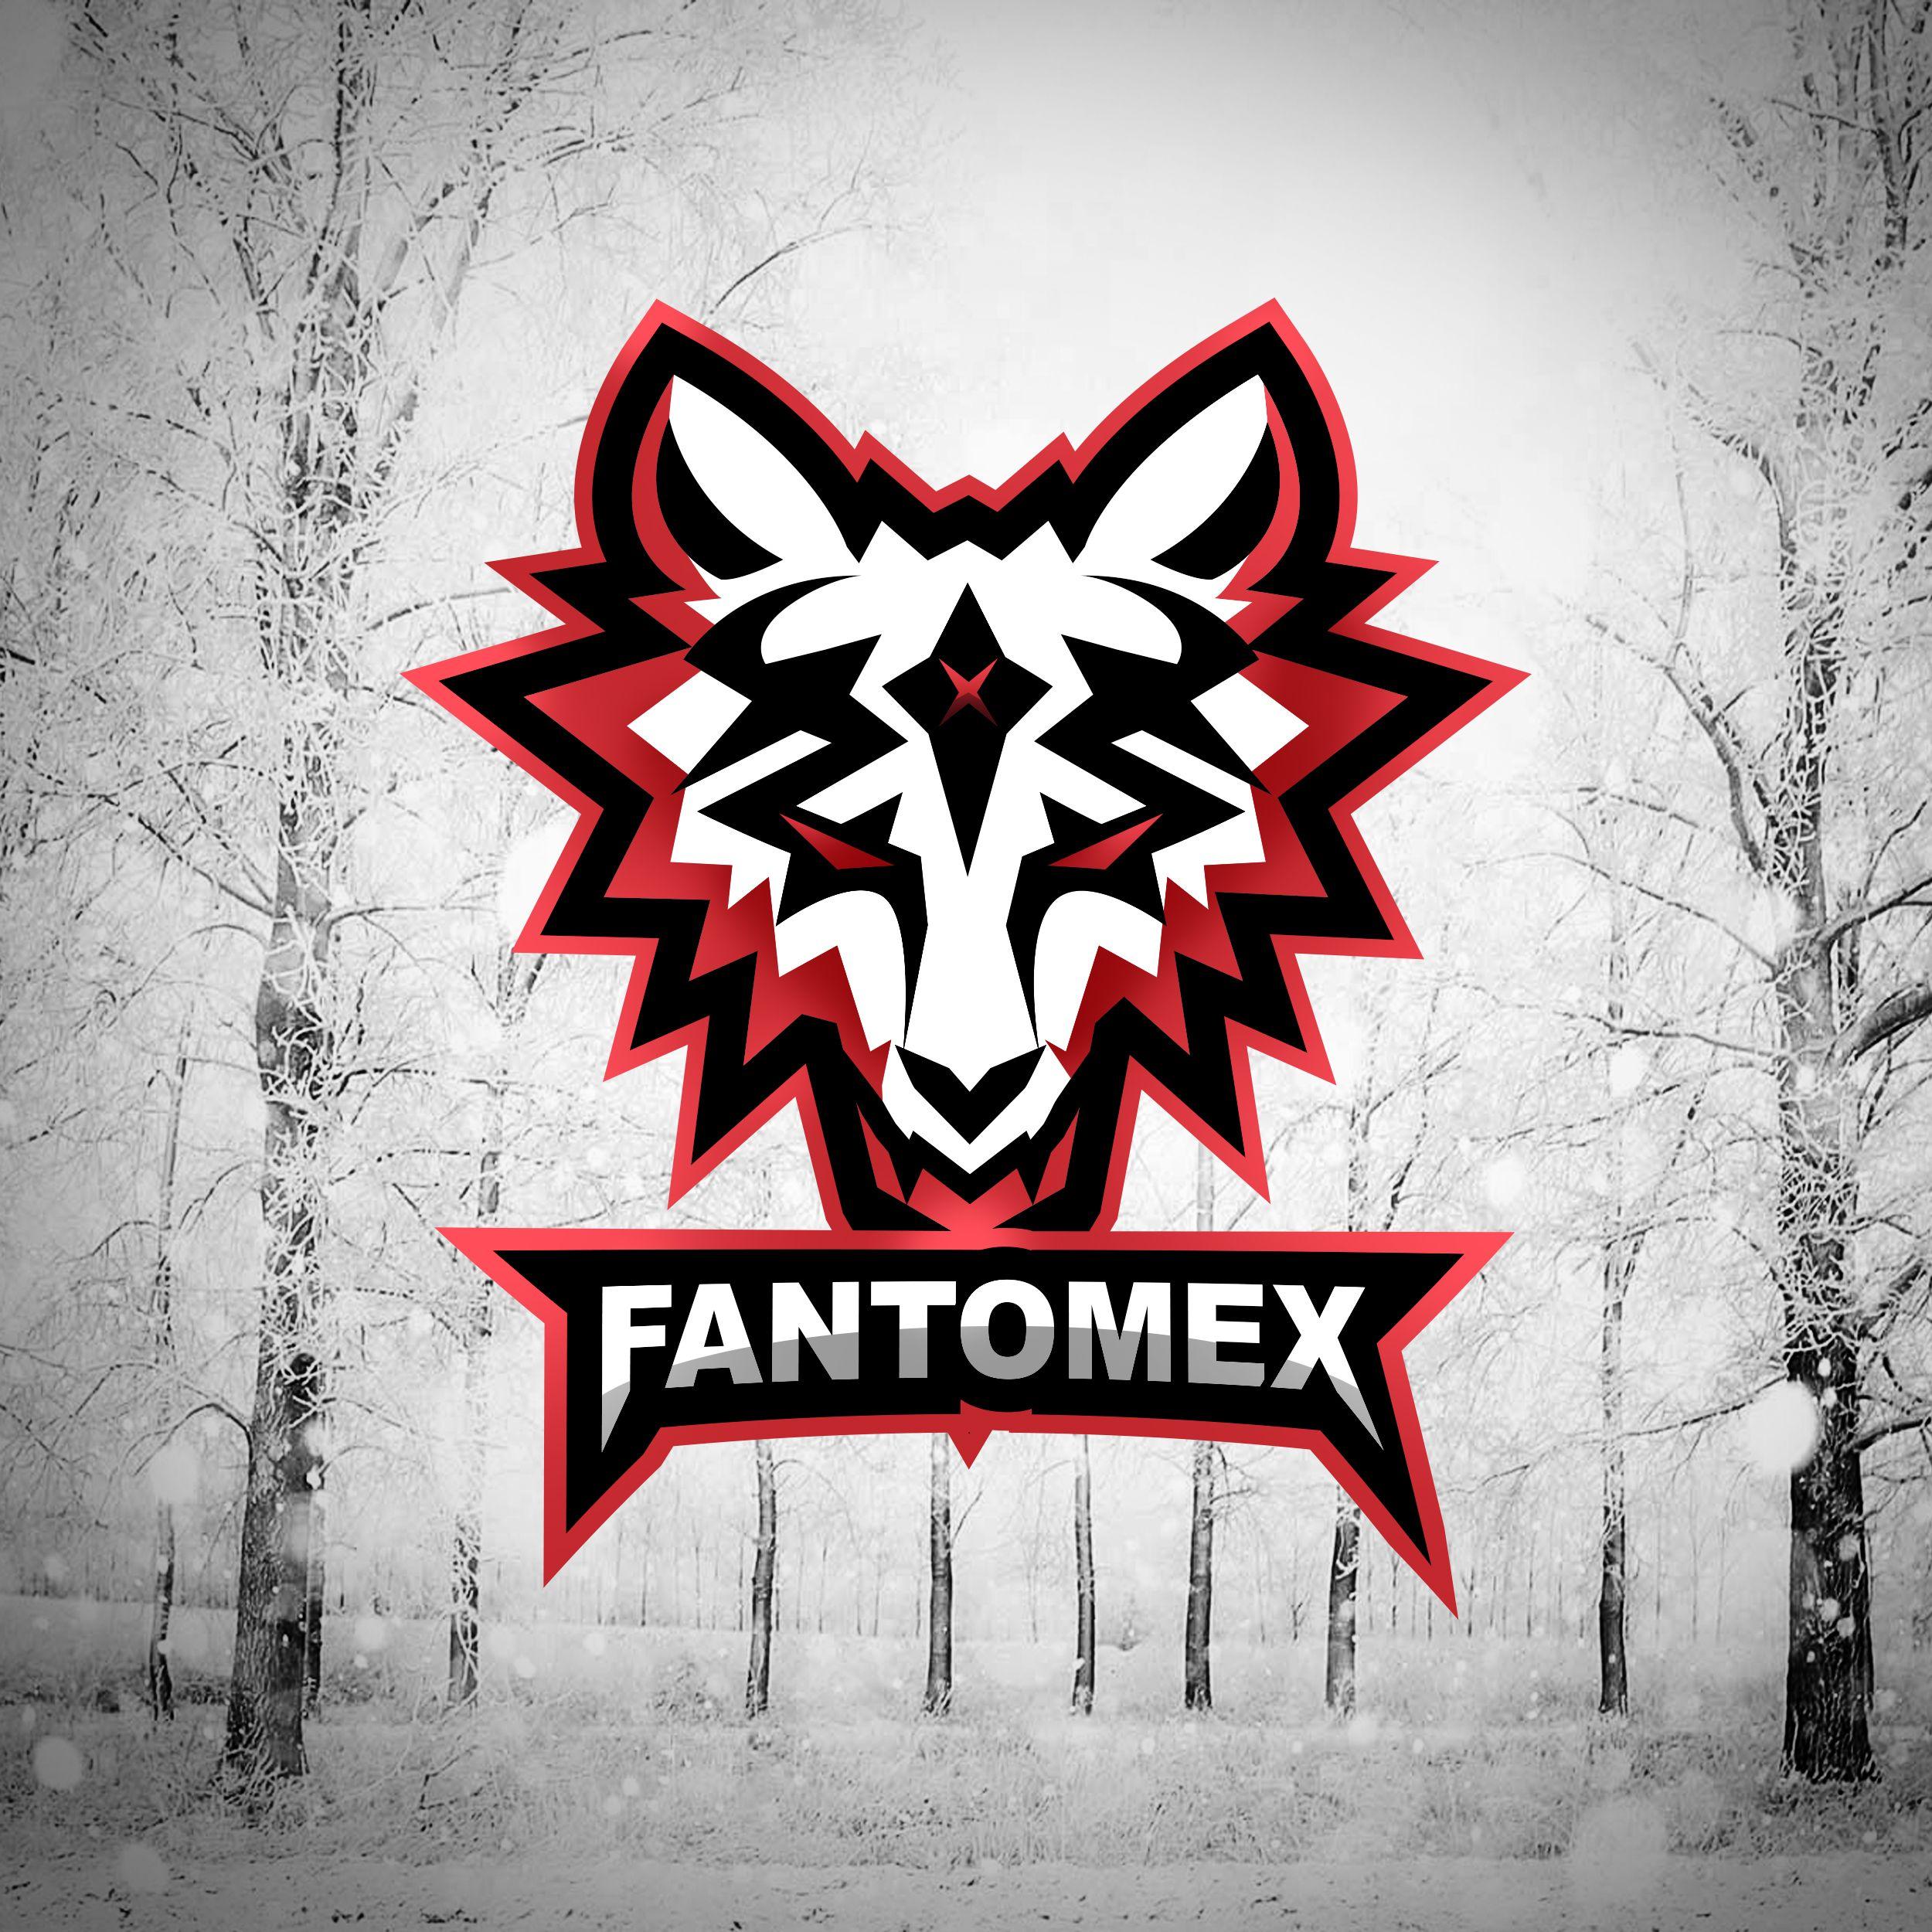 My freind name in game logo Papel de parede futebol